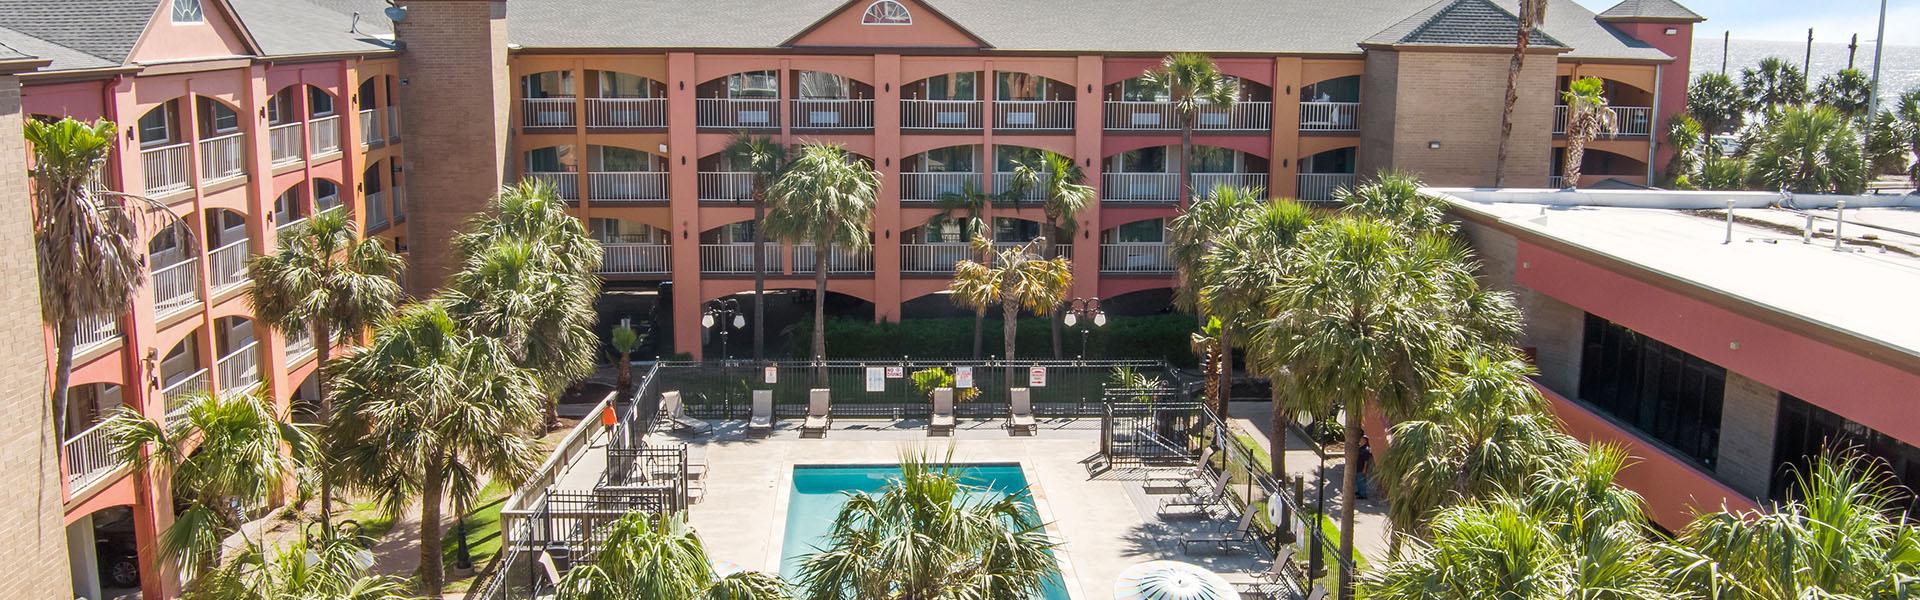 Beachfront Palms Hotel, Galveston TX